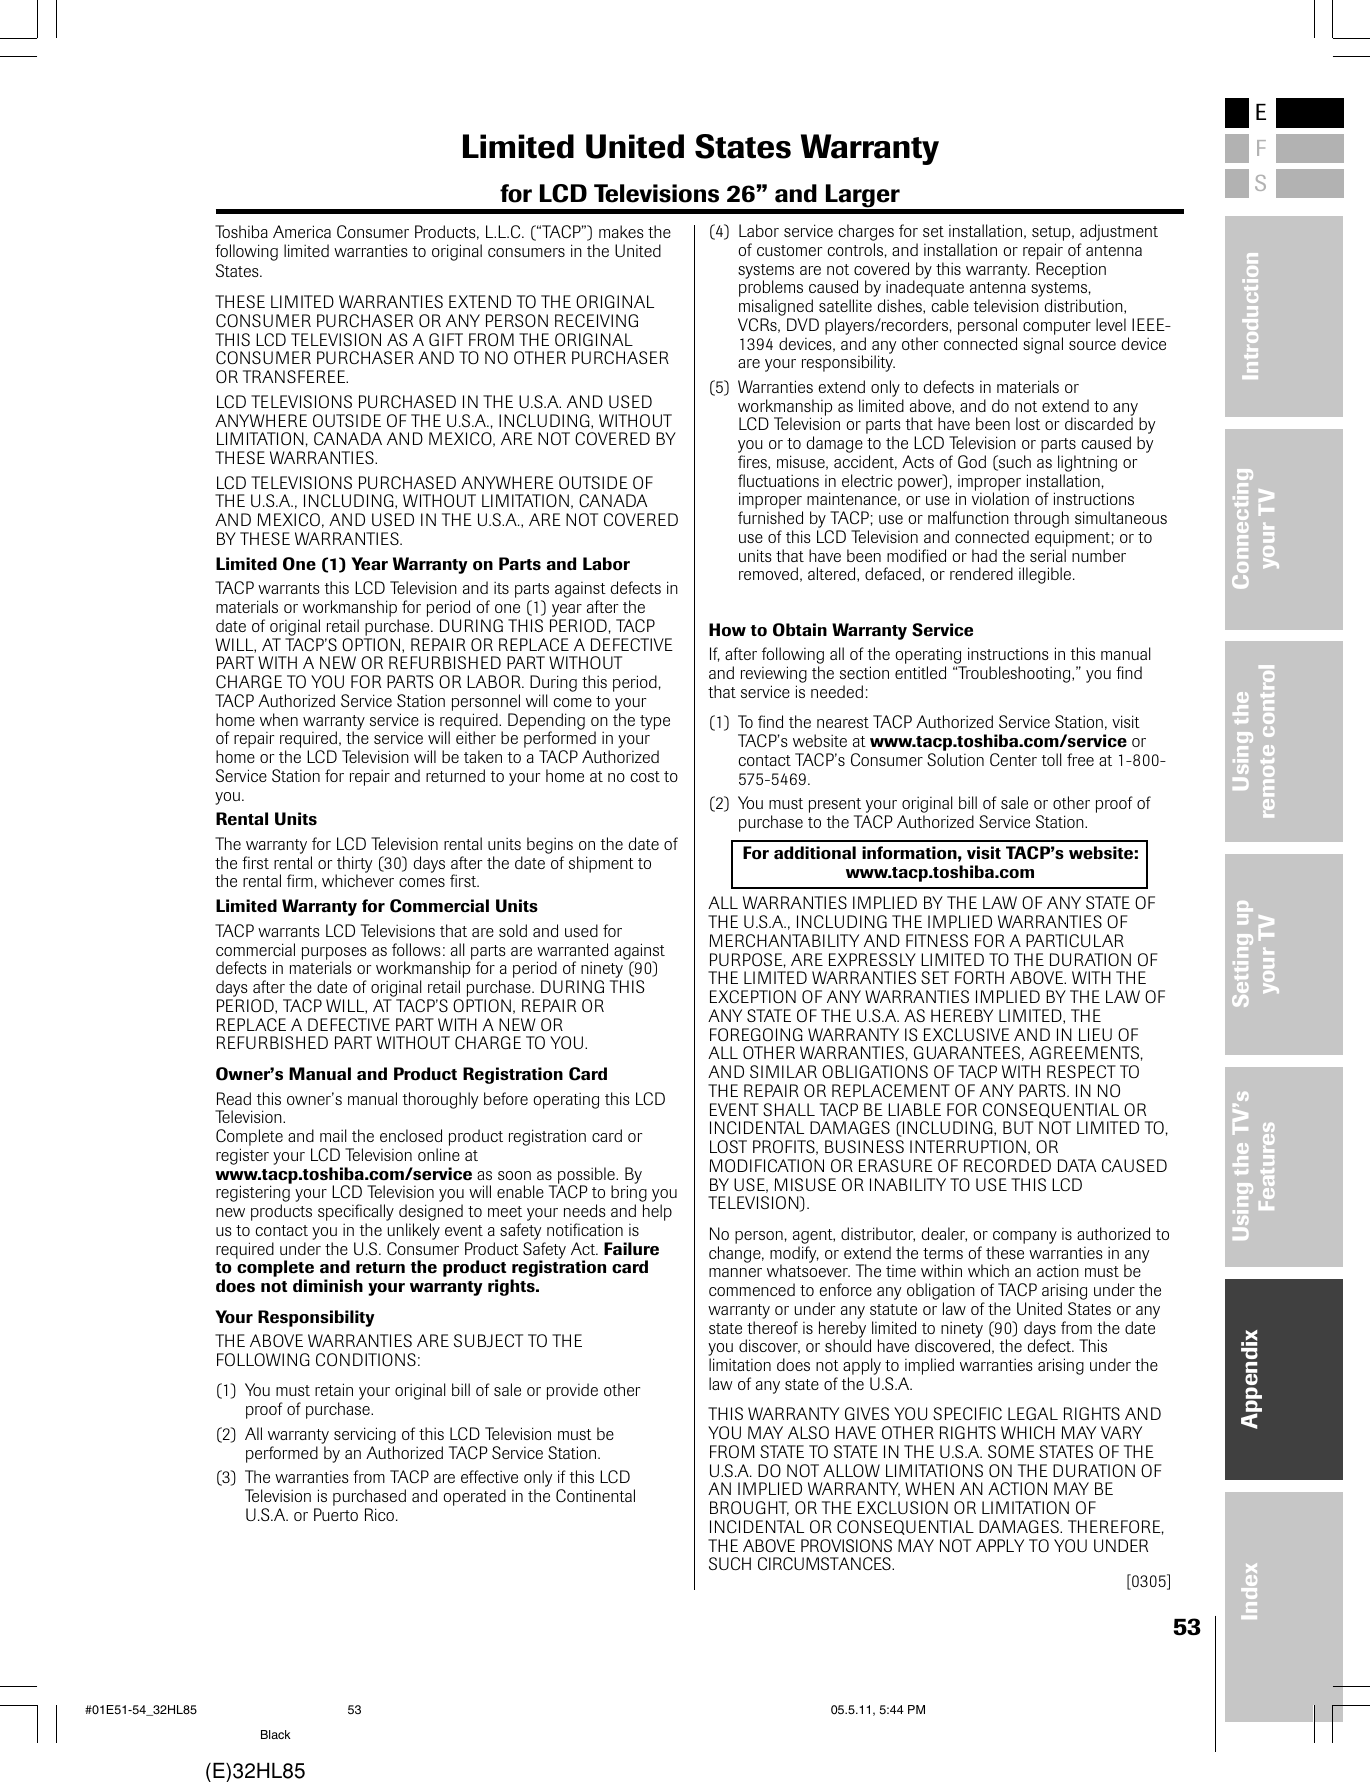 Toshiba 32Hl85 Owners Manual #01E01_32HL85